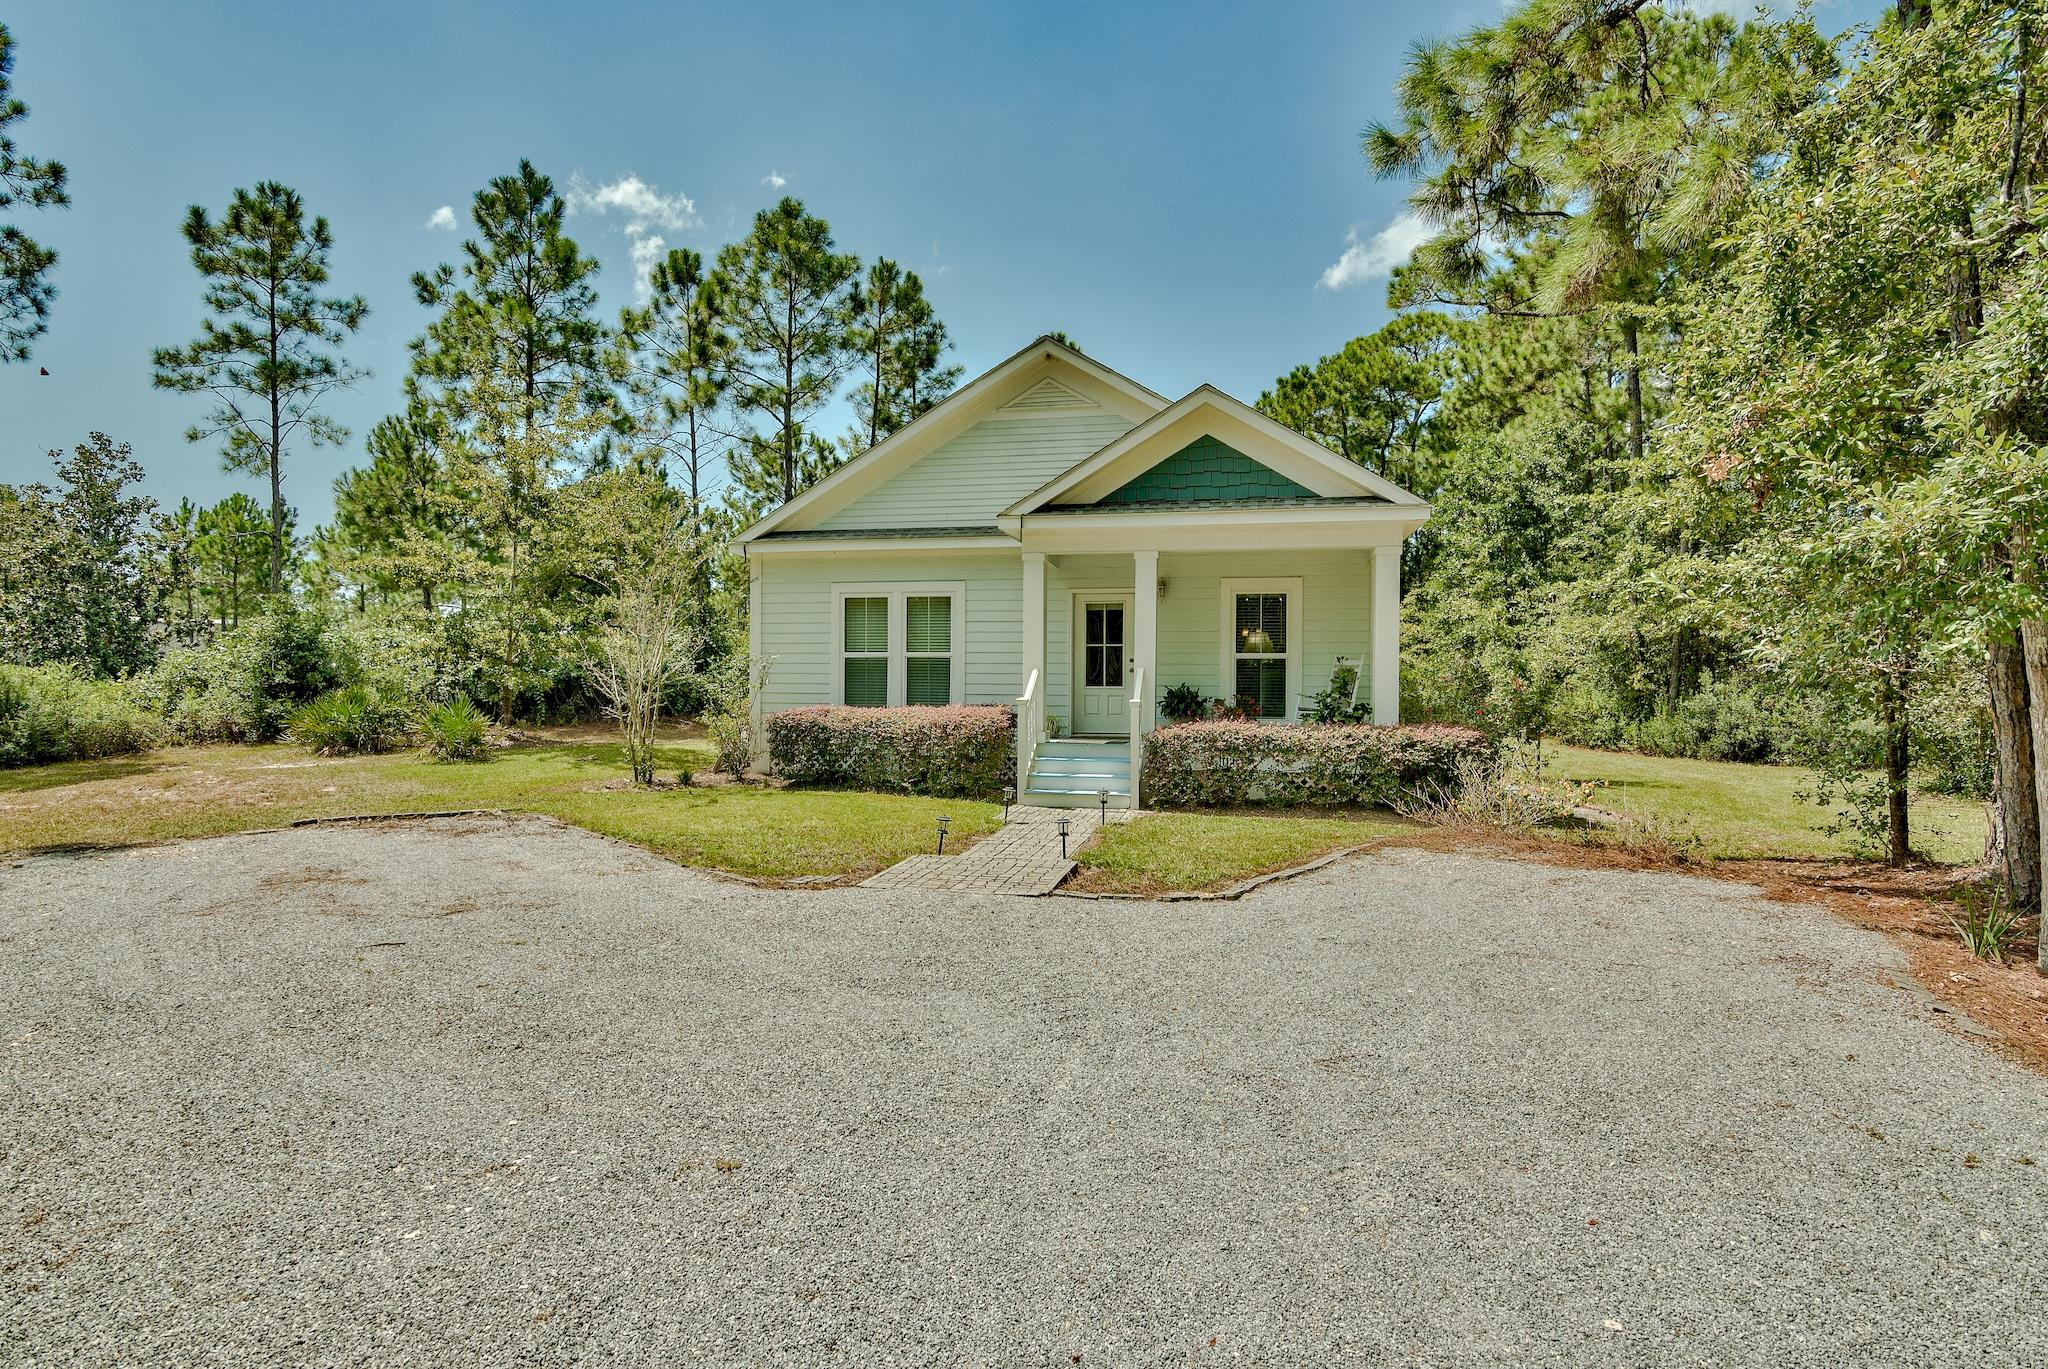 Photo of home for sale at 33 Edgewood, Santa Rosa Beach FL